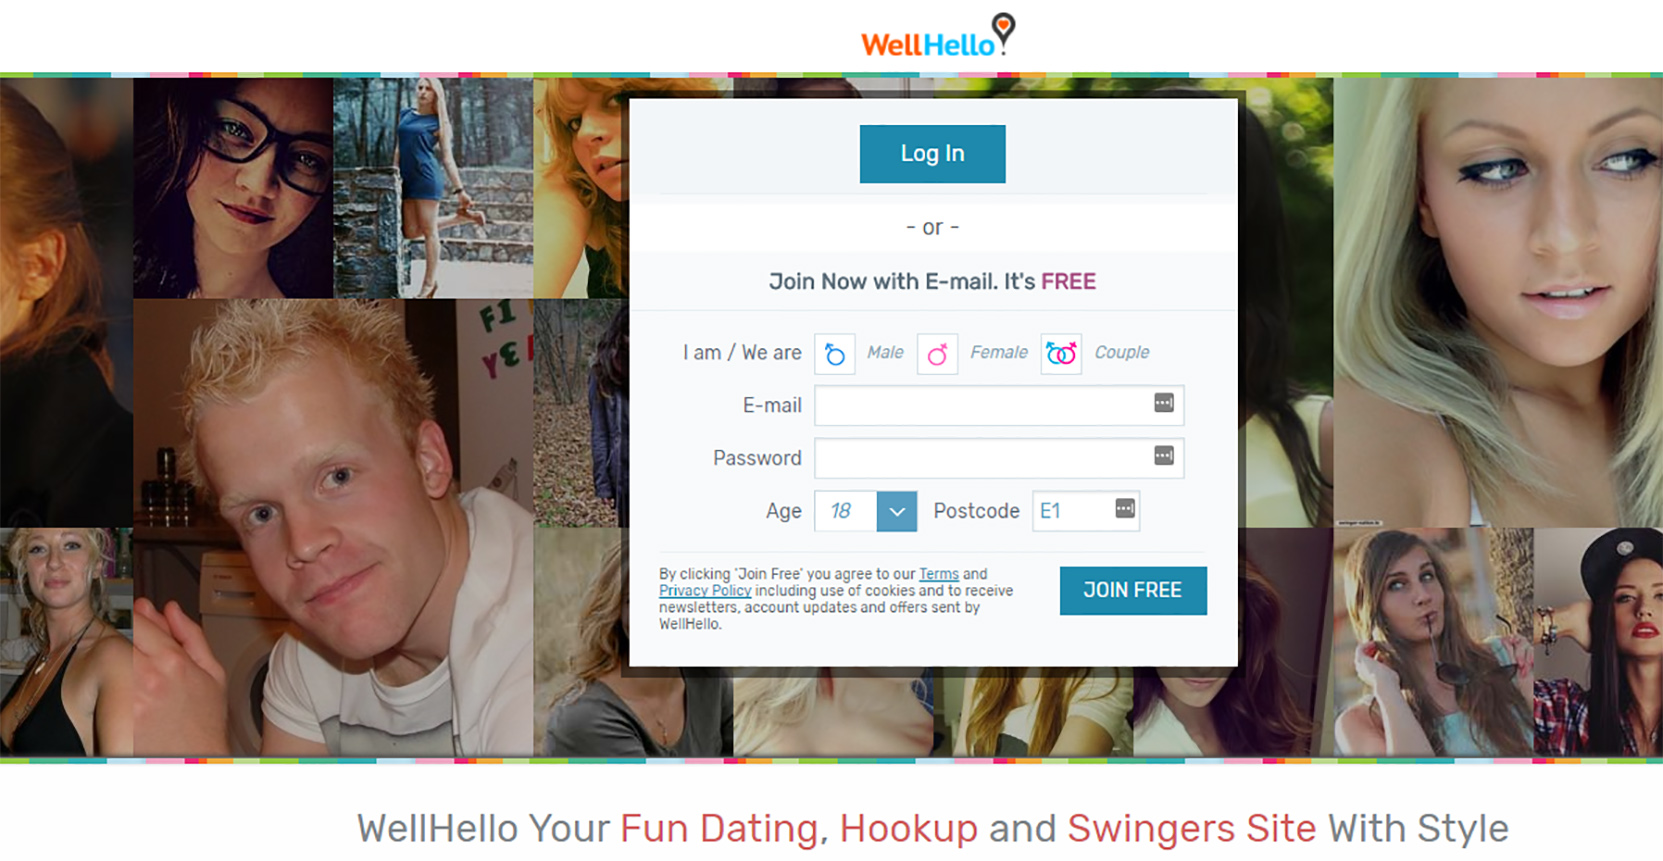 WellHello Sign-up